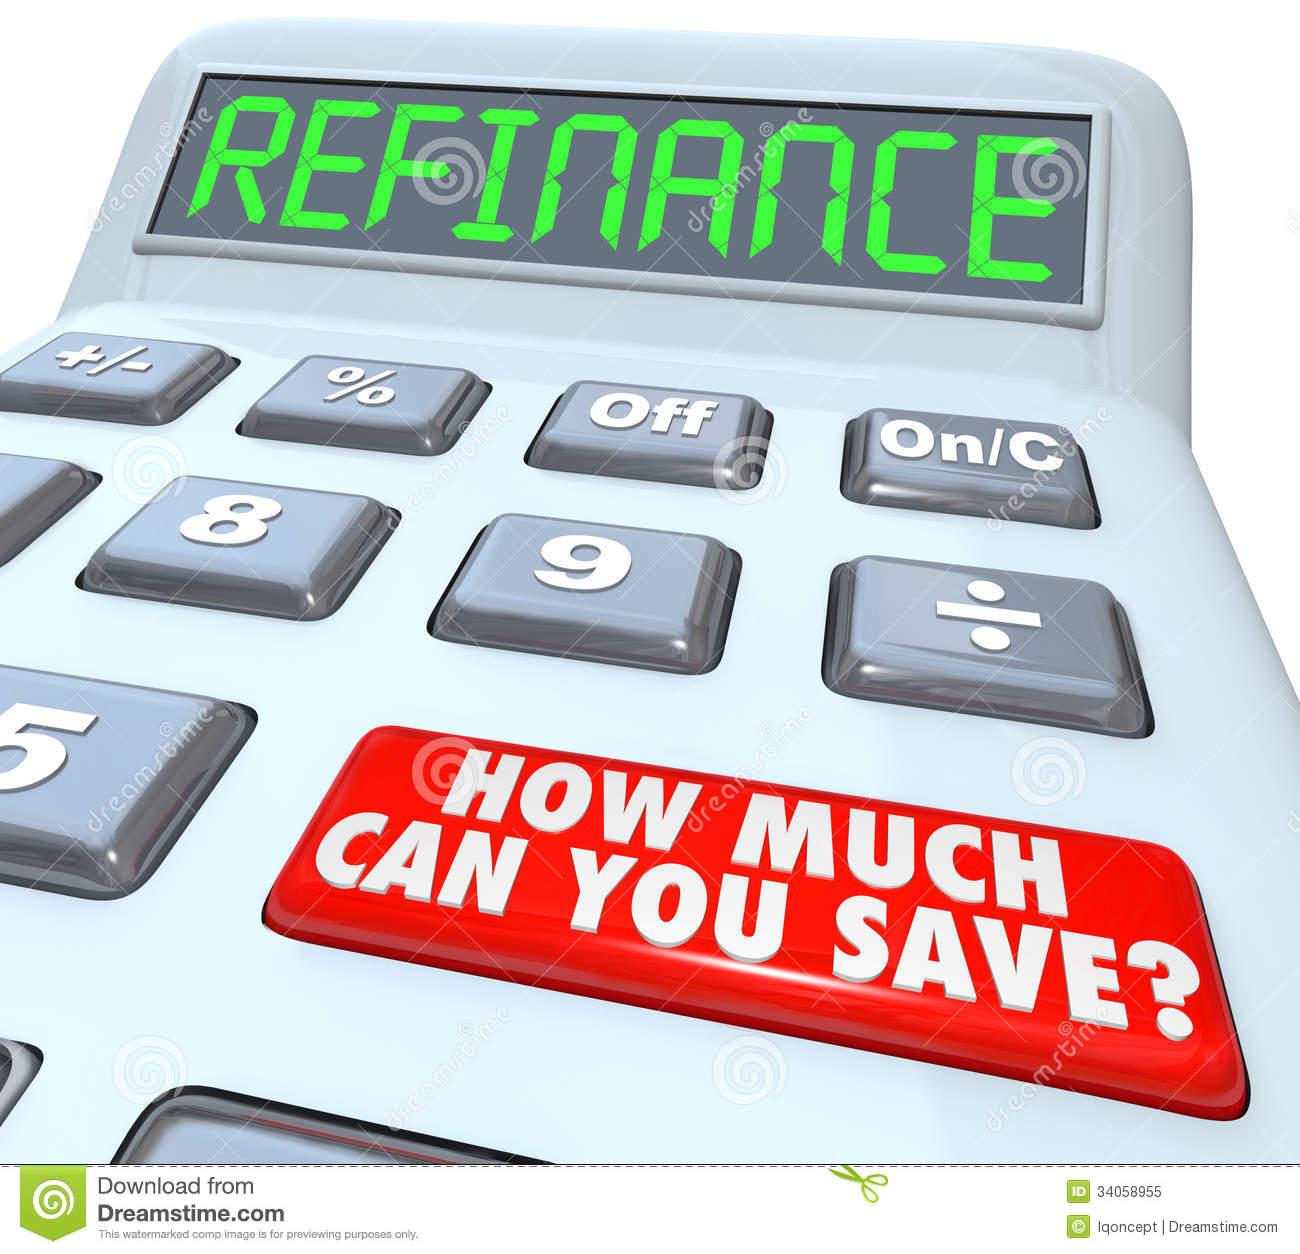 Refinance Clipart.